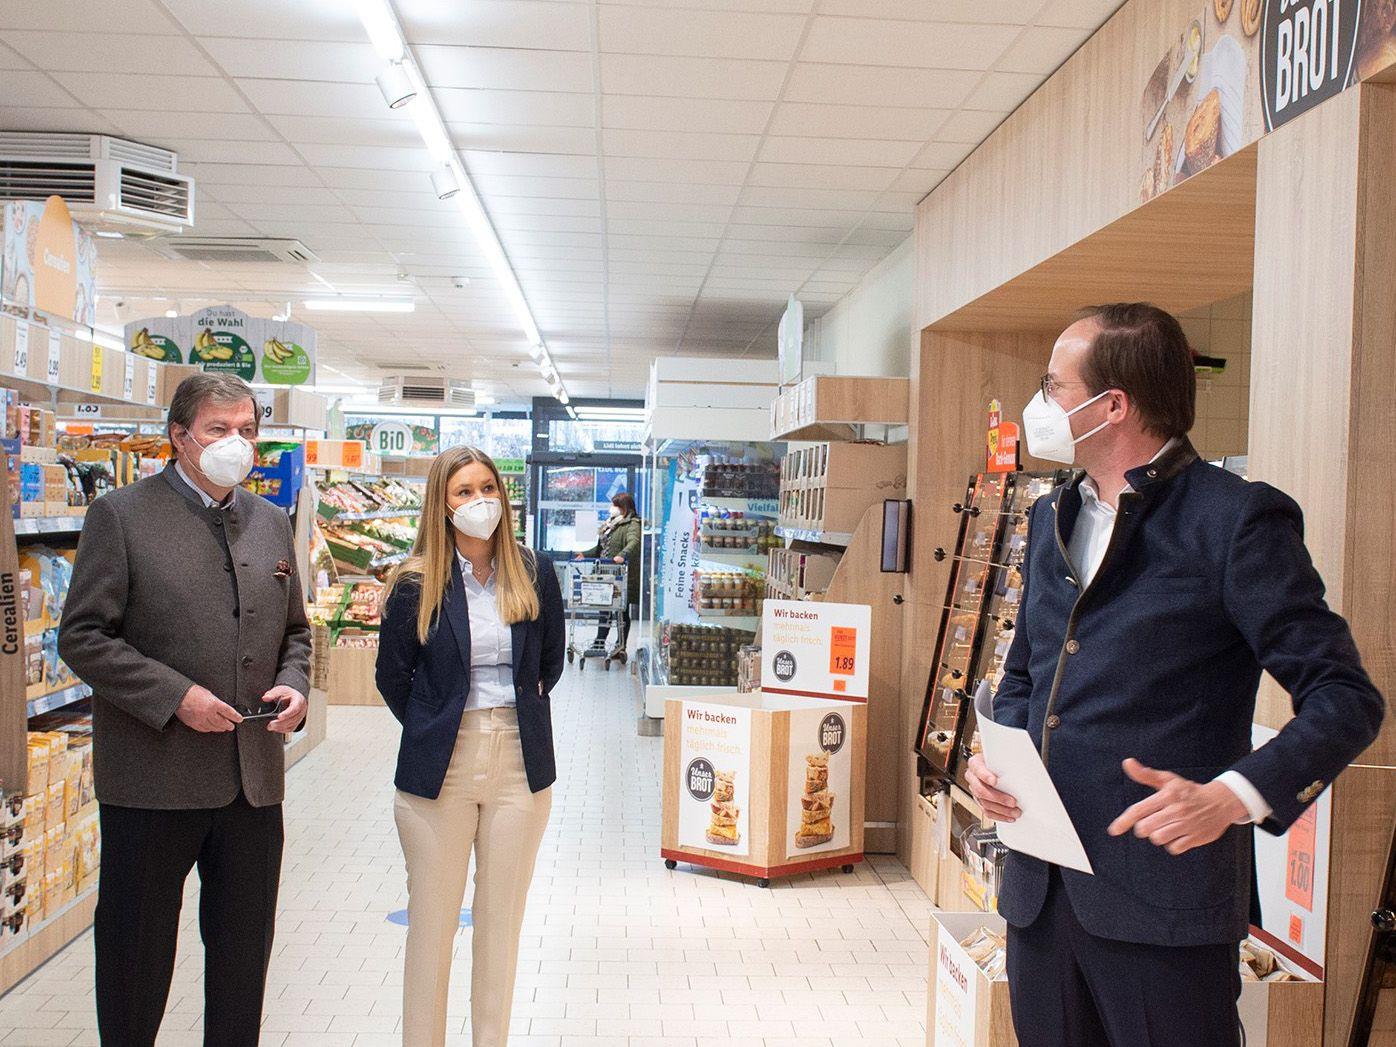 Bayerische Staatsministerin Michaela Kaniber besucht Lidl-Filiale